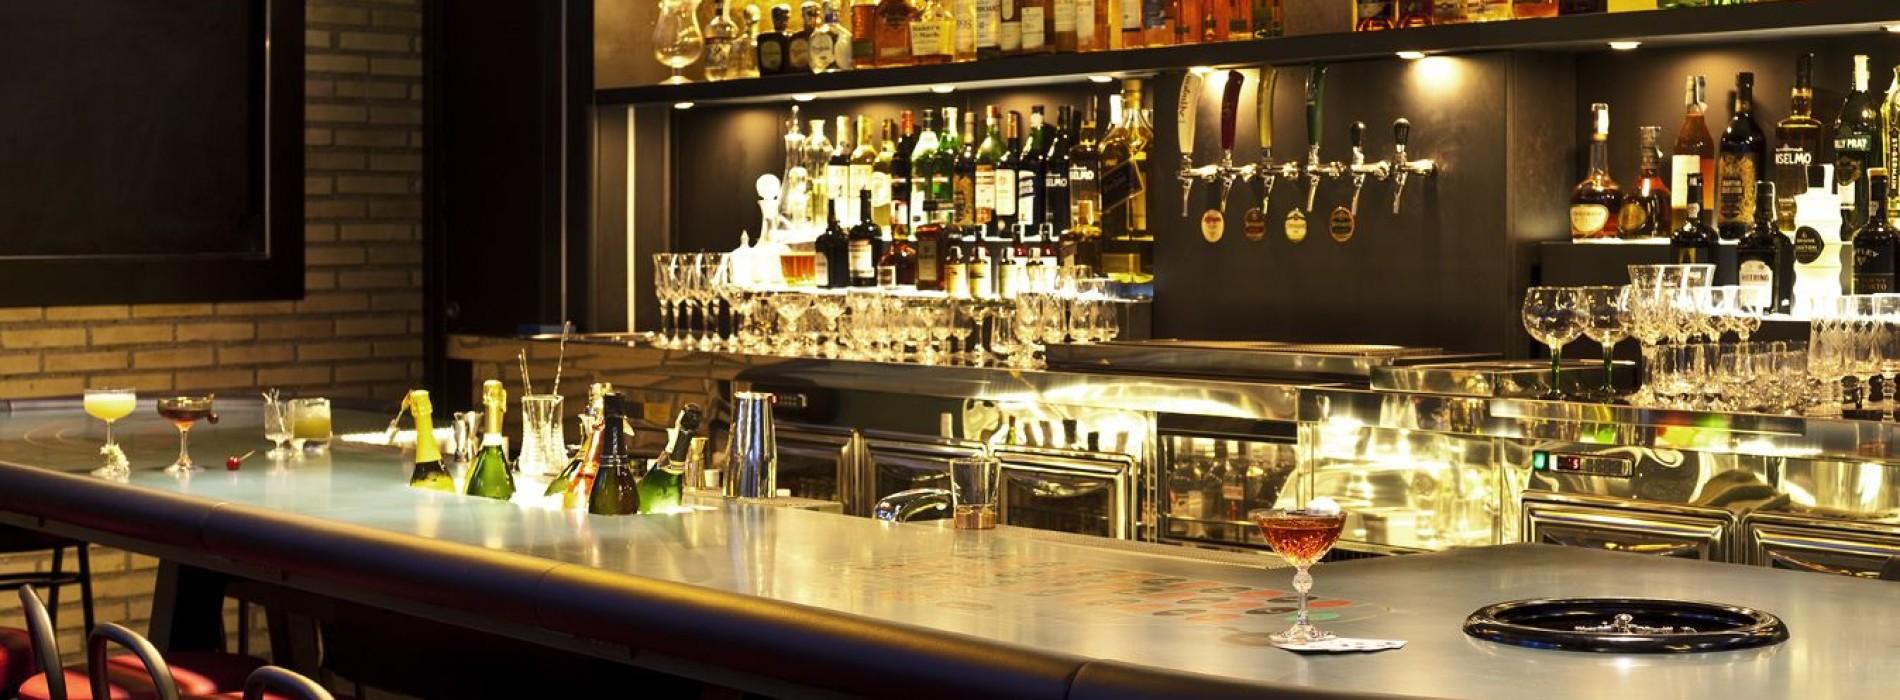 Spirito, bar speakeasy, e Premiata panineria aprono al Pigneto ...